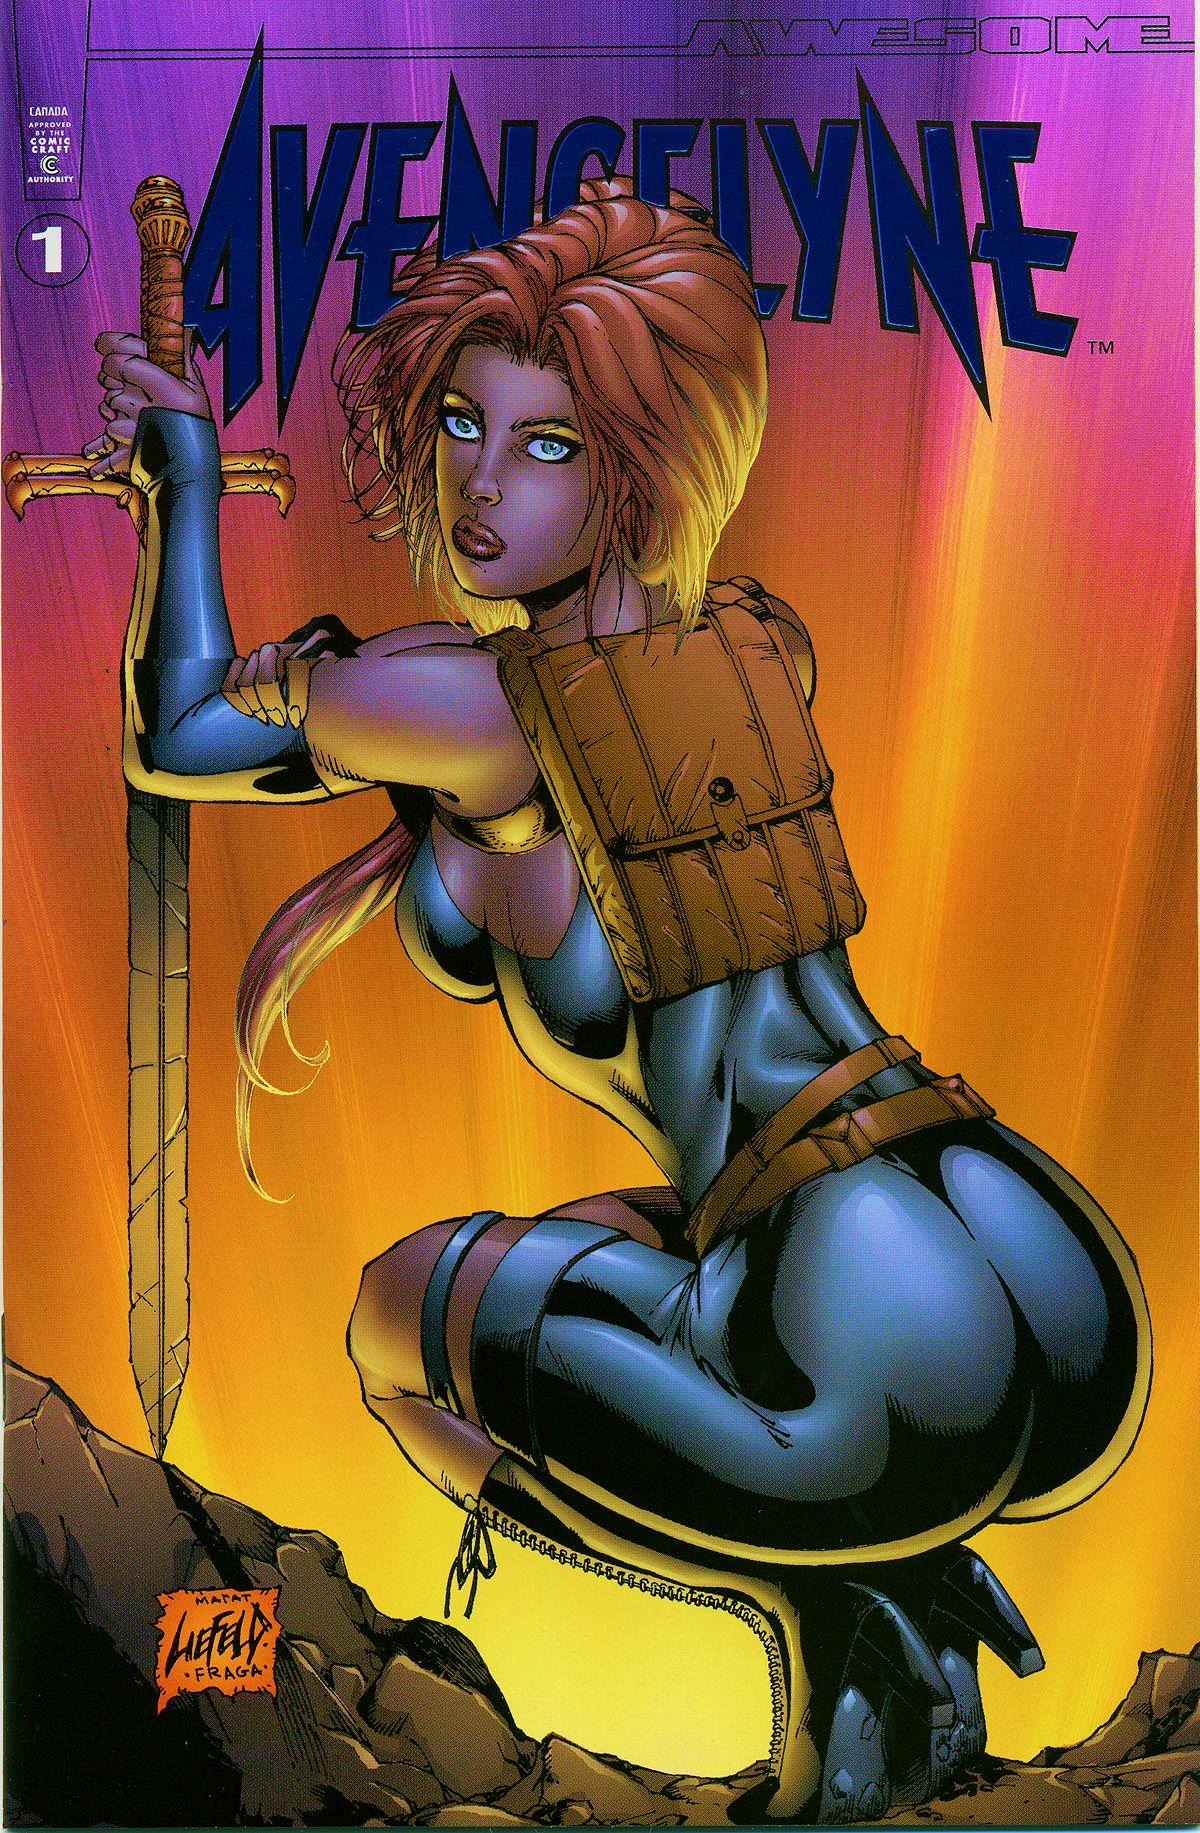 Avengelyne (1999) Full Page 1